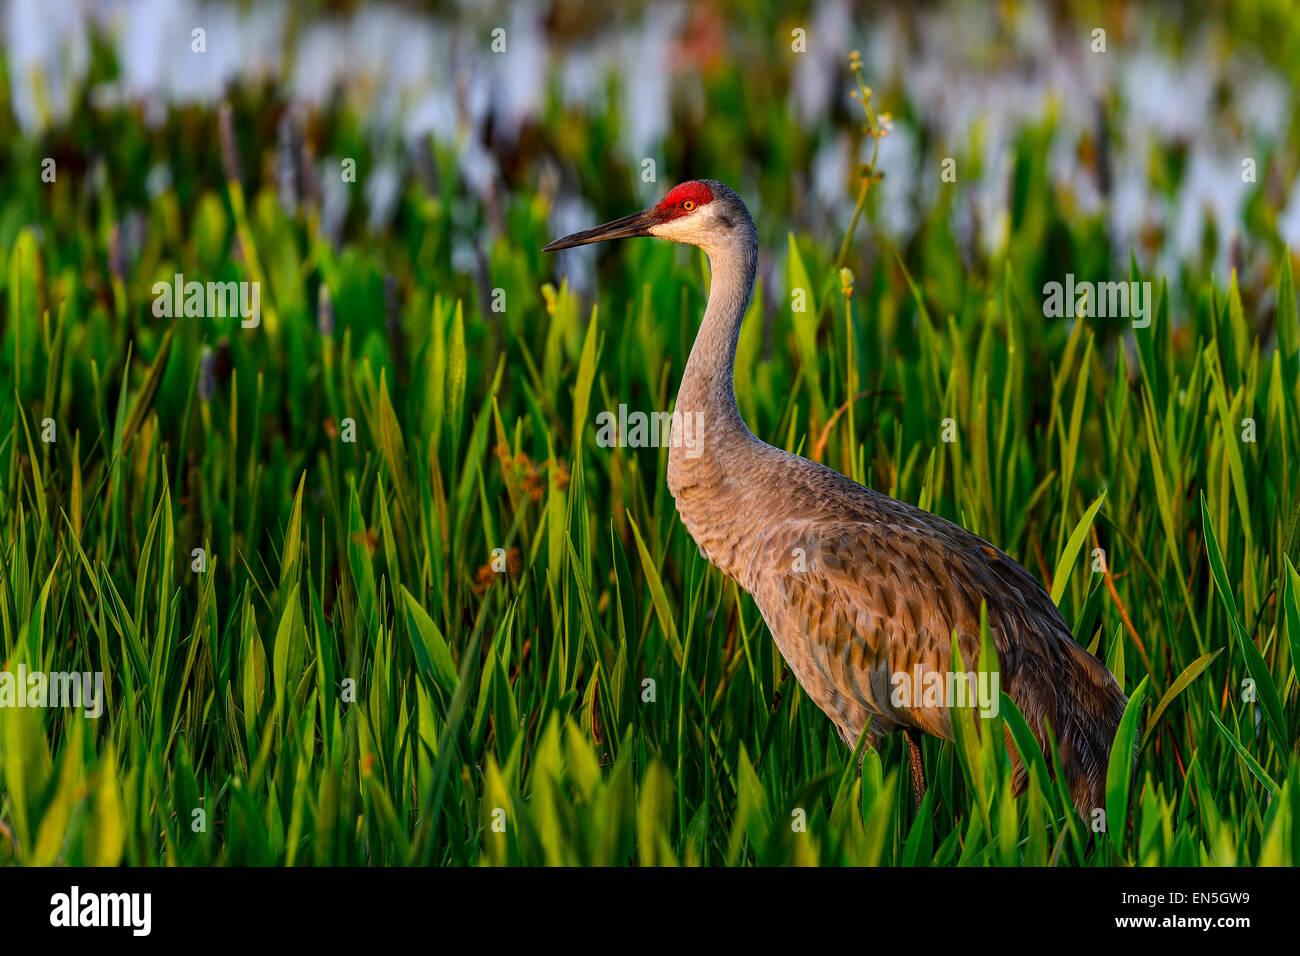 sandhill crane, viera wetlands - Stock Image